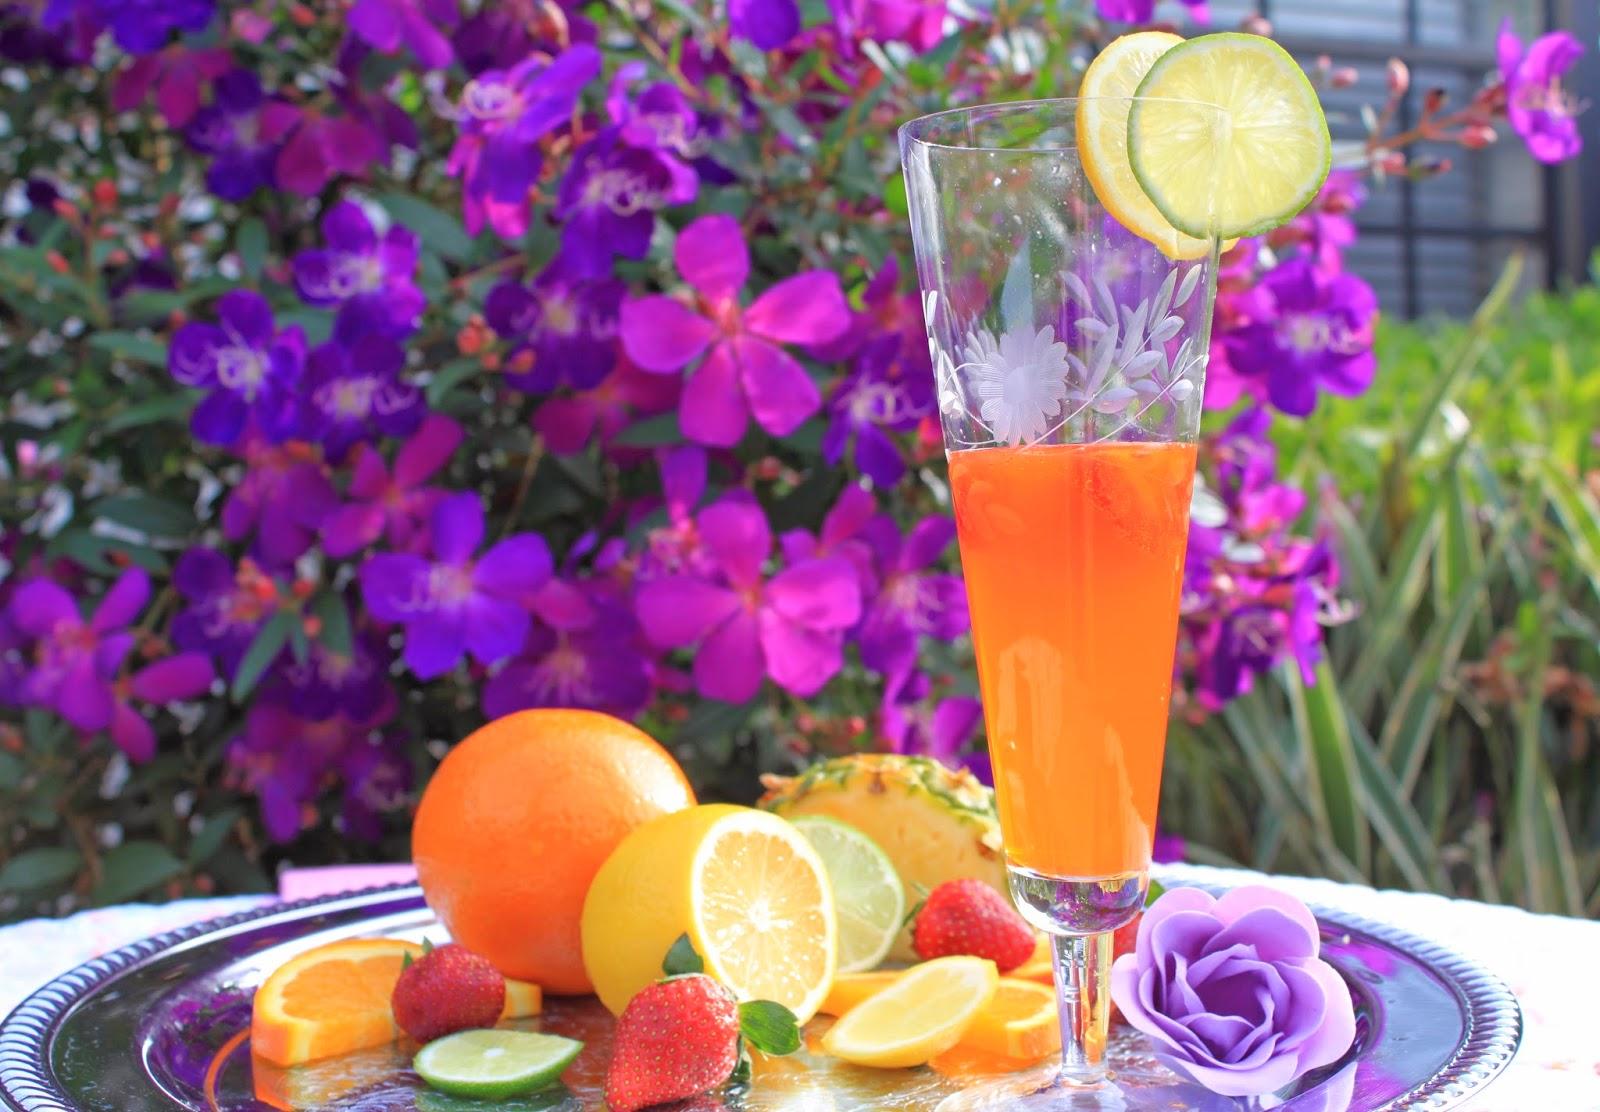 Blogger Mash Elle shares an easy 5 calorie cocktail recipe